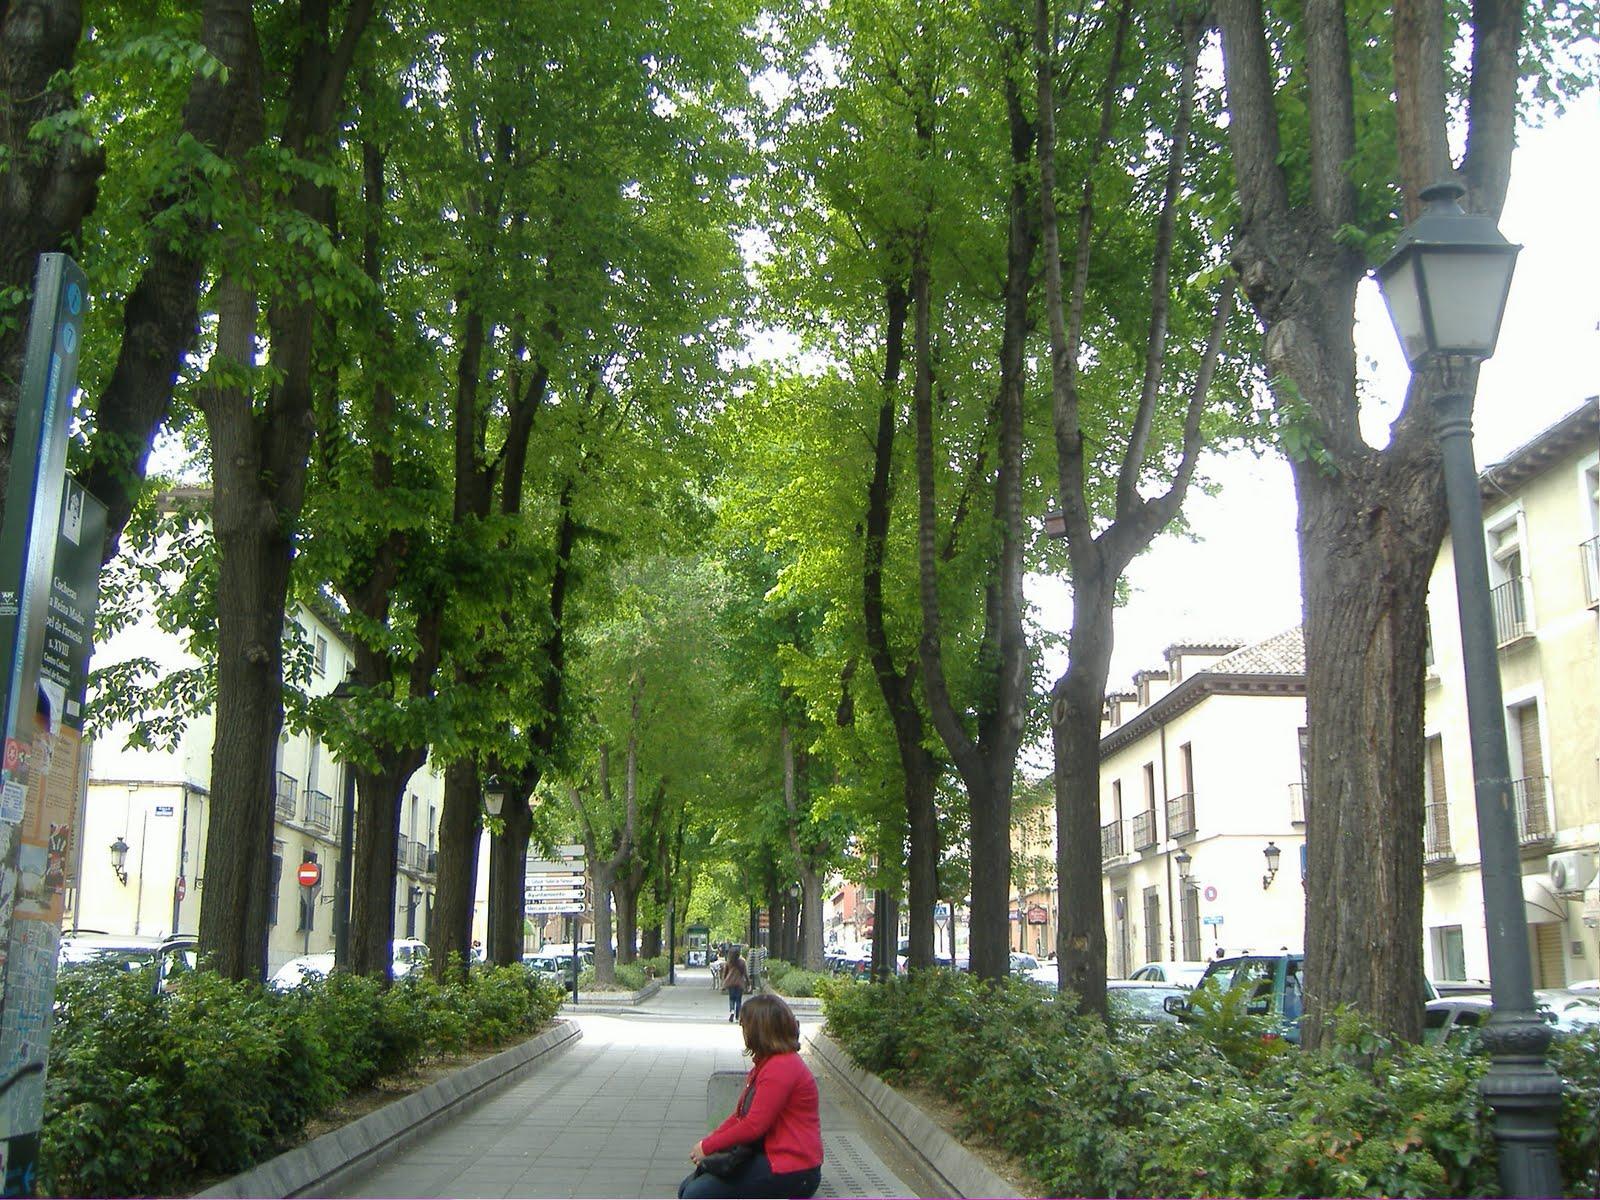 Prejubilada sin fronteras 4 paseo historico campestre for Cementerio jardin del mar